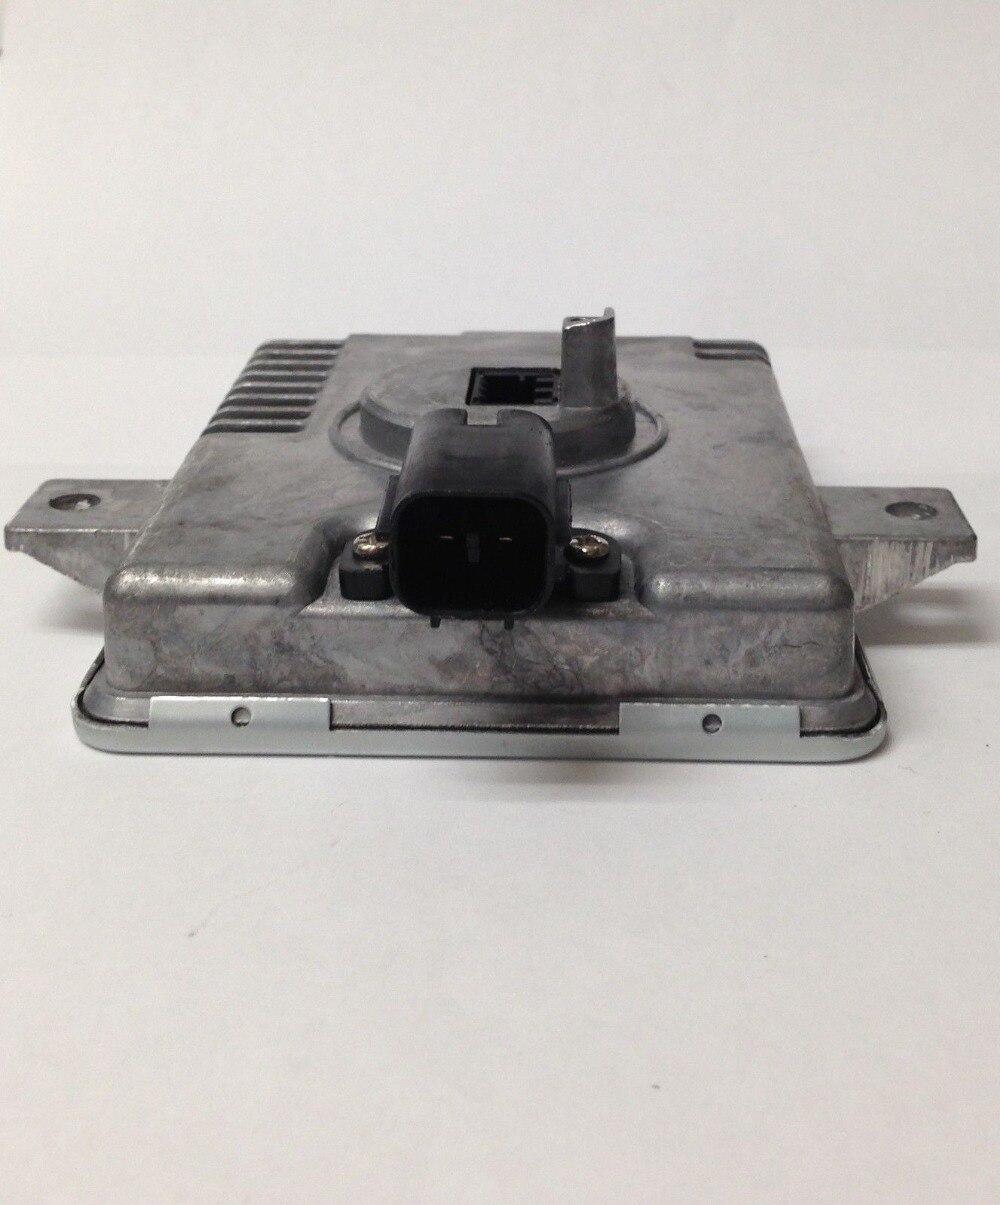 Buy H Onda S2000 Ap2 Xenon Headlight Hid Ballast Fuse Box Control Unit From Reliable Suppliers On Xenonoemballast Store